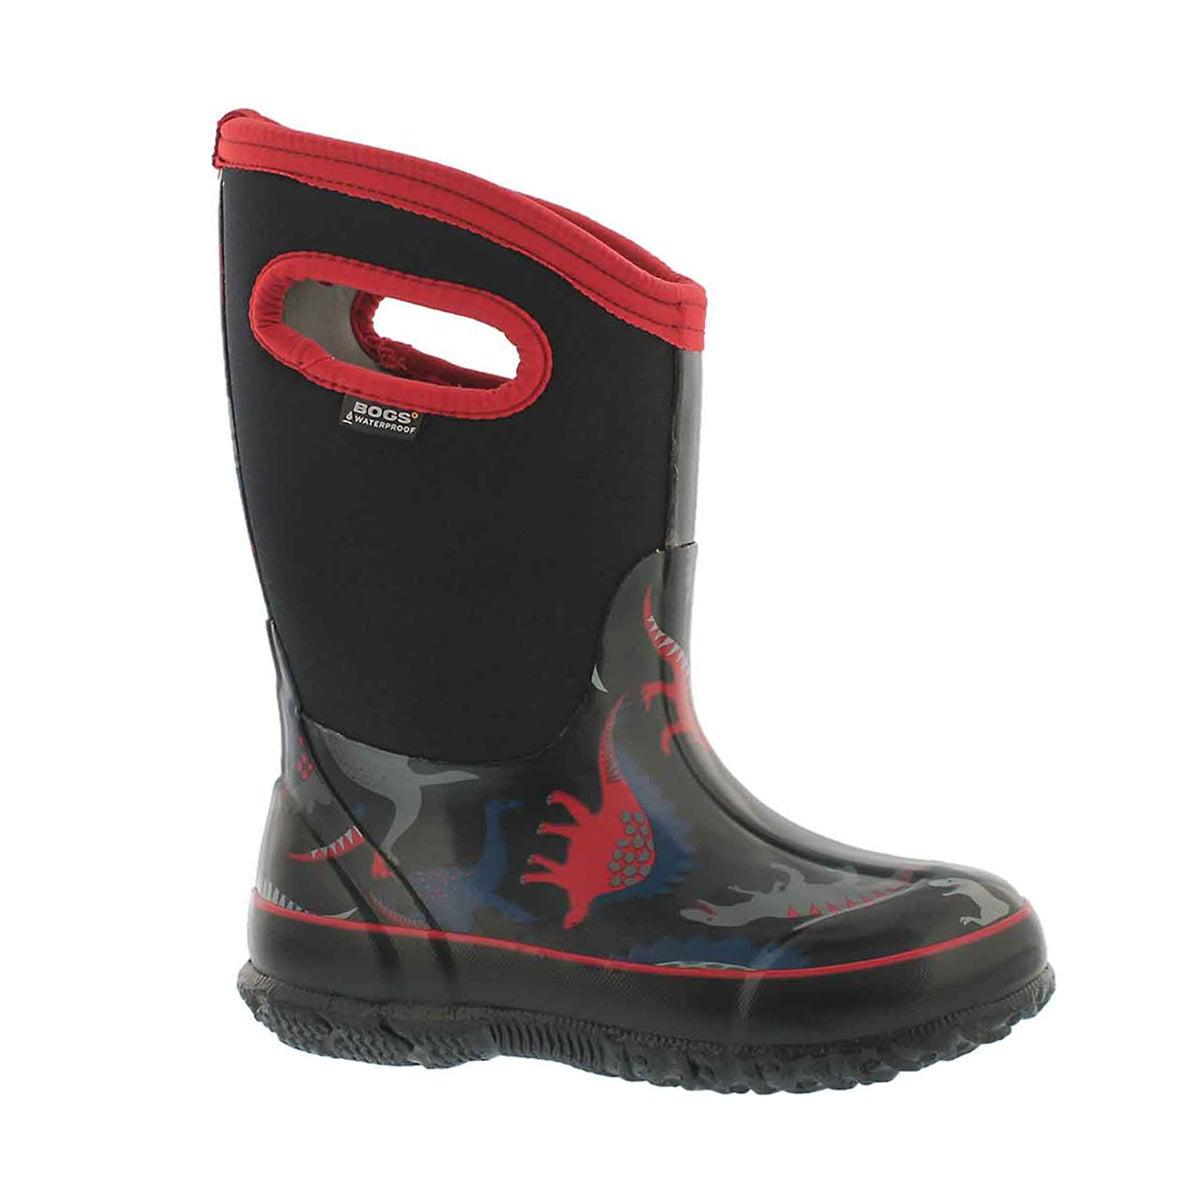 Boys' CLASSIC DINO black multi waterproof boots